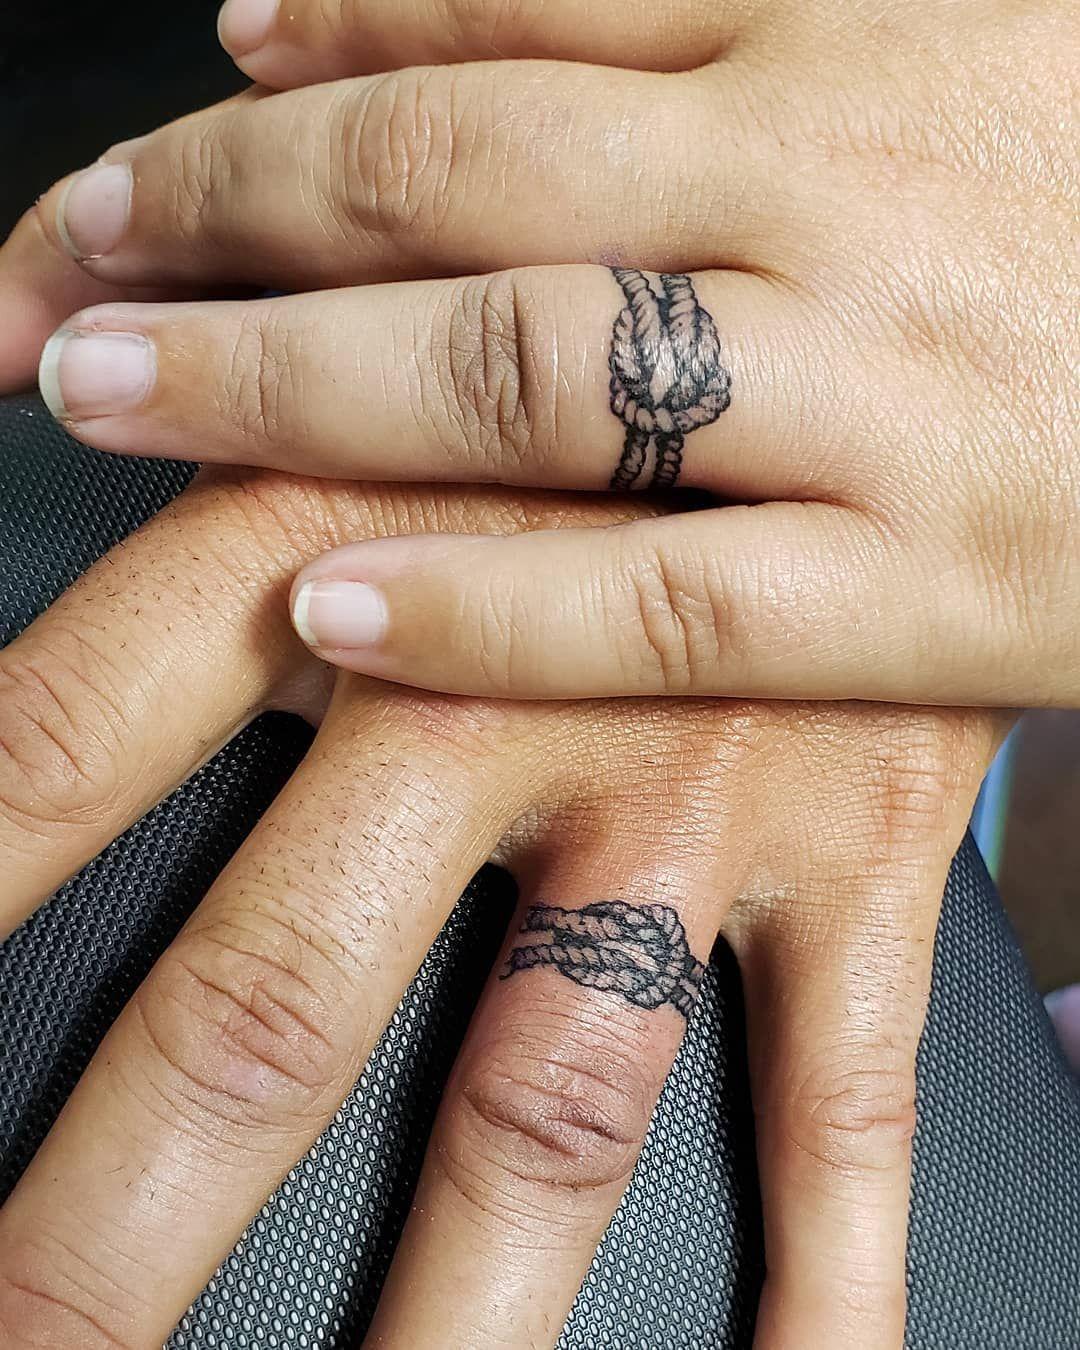 Wedding Ring Tattoos Weddingringtattoo Weddingtattoo Tattoo Wedding Ringtatoo Wedding Ta Ring Finger Tattoos Couple Tattoos Unique Wedding Finger Tattoos